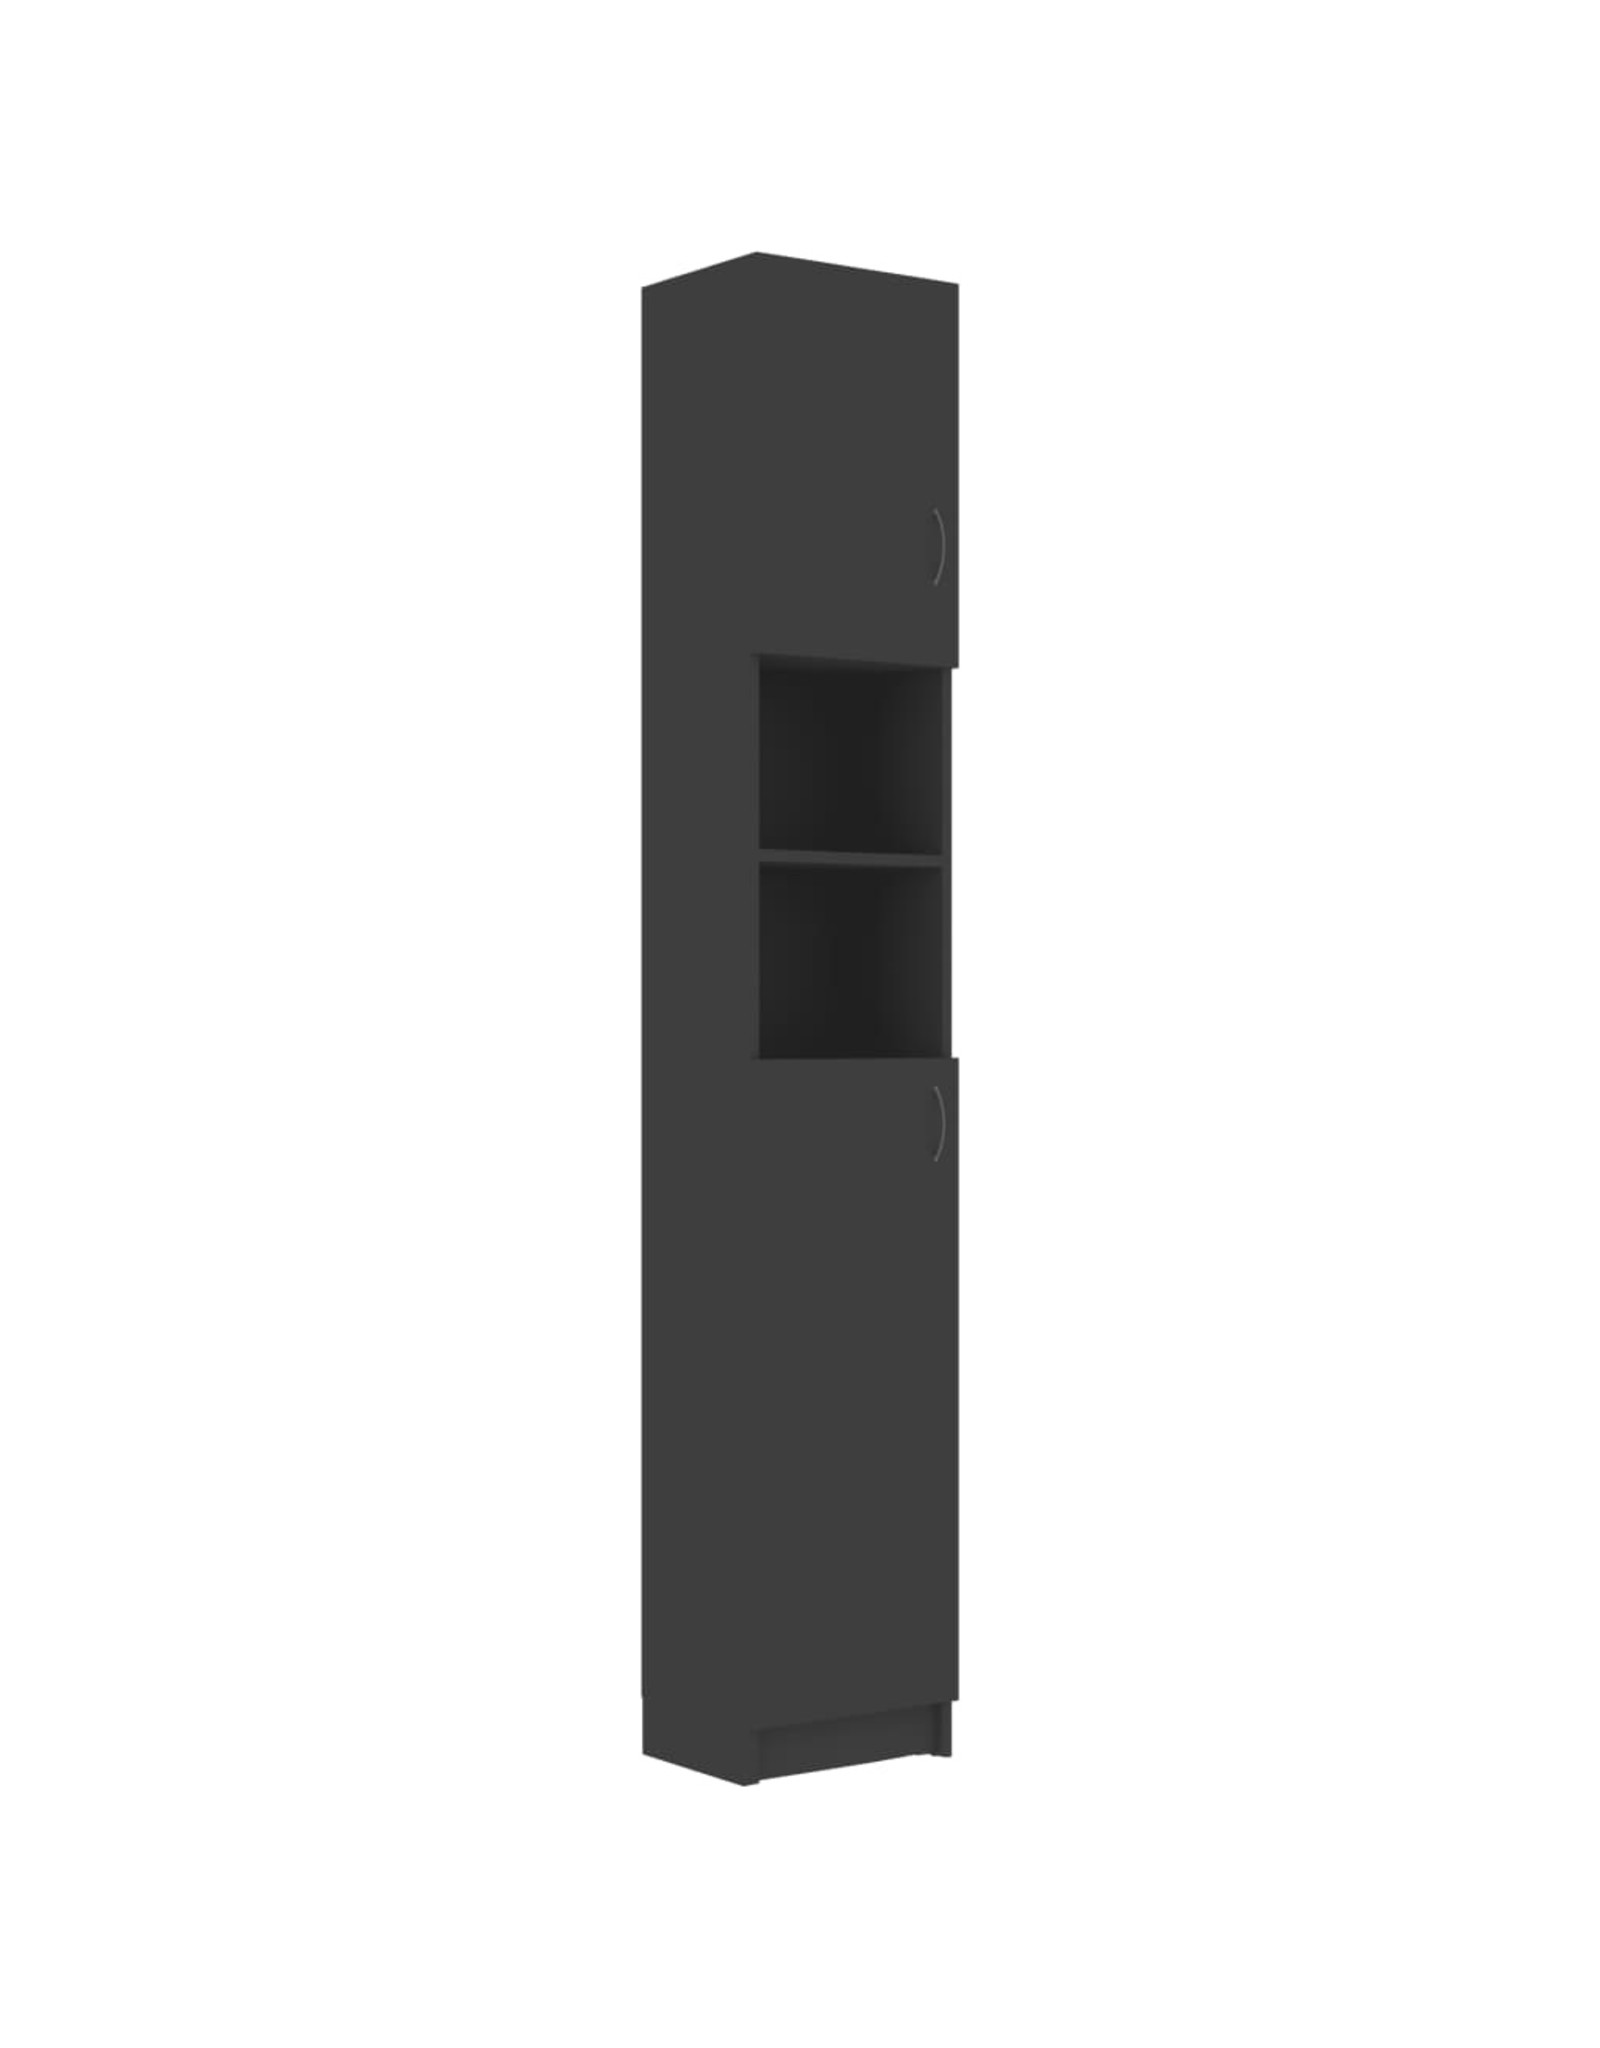 Badkamerkast 32x25,5x190 cm spaanplaat grijs